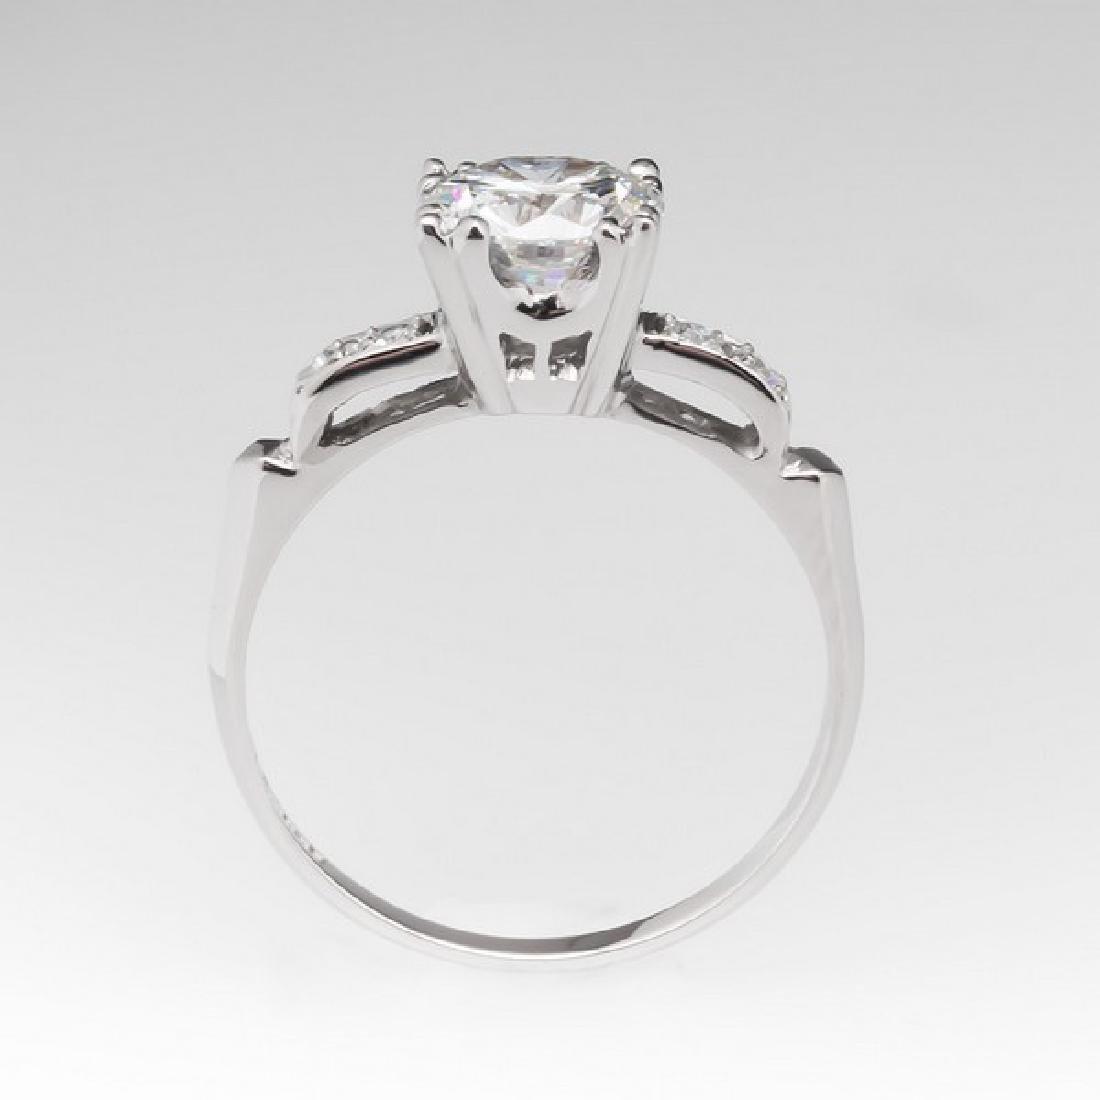 VINTAGE PLATINUM GIA DIAMOND ENGAGEMENT RING - 3